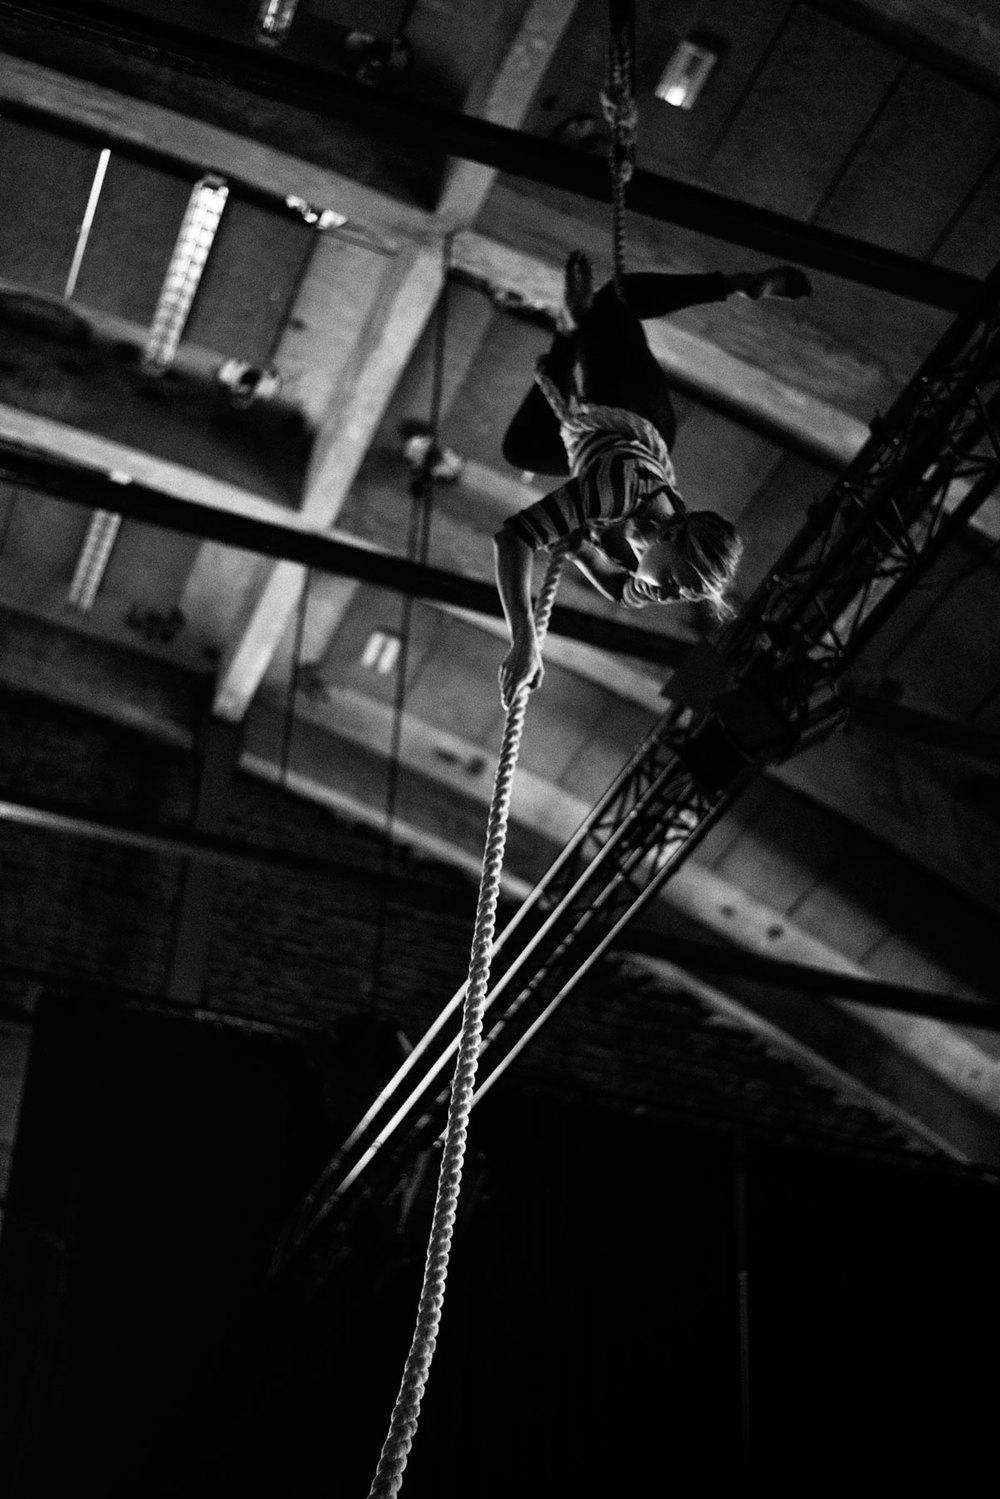 ilona-jantti-acrobat-helsinki-finland.jpg